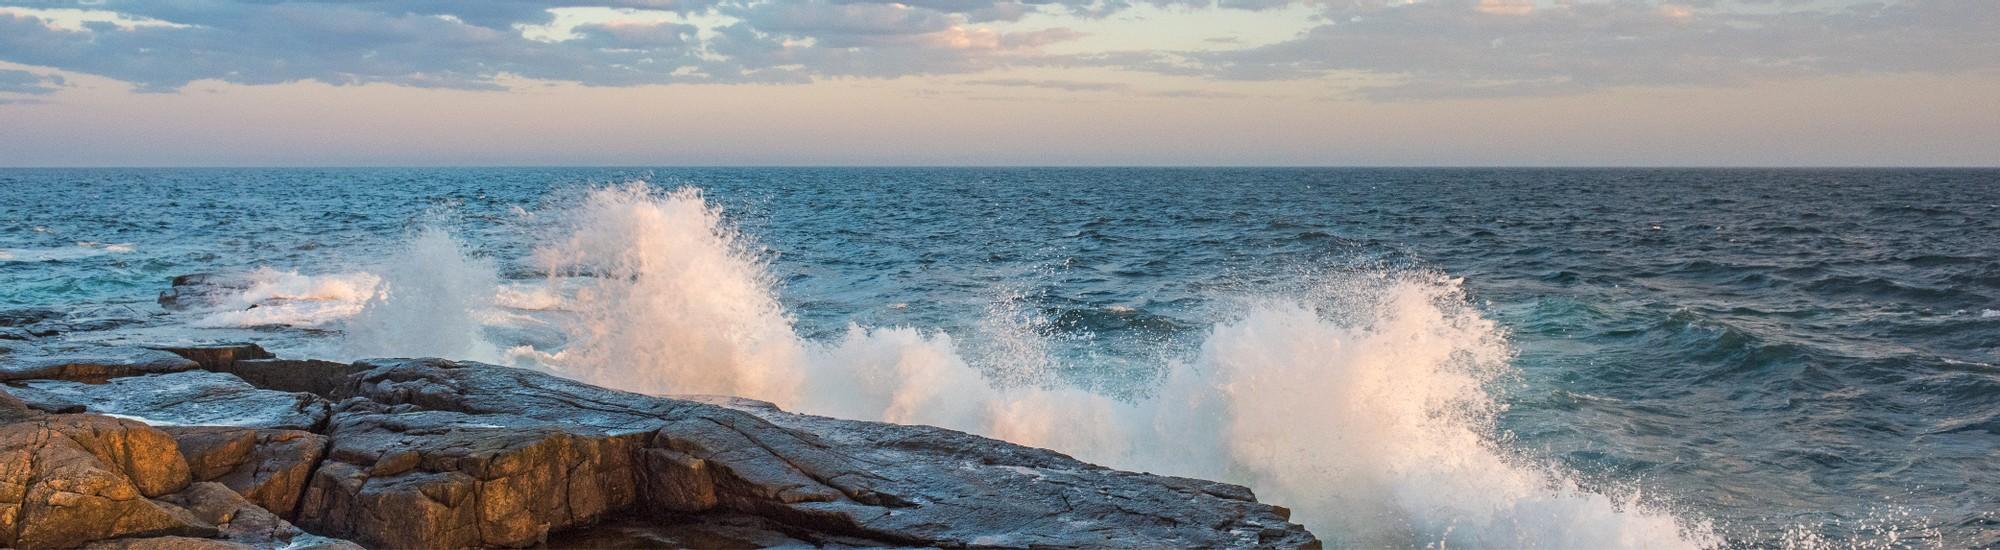 Ocean surf on rocks